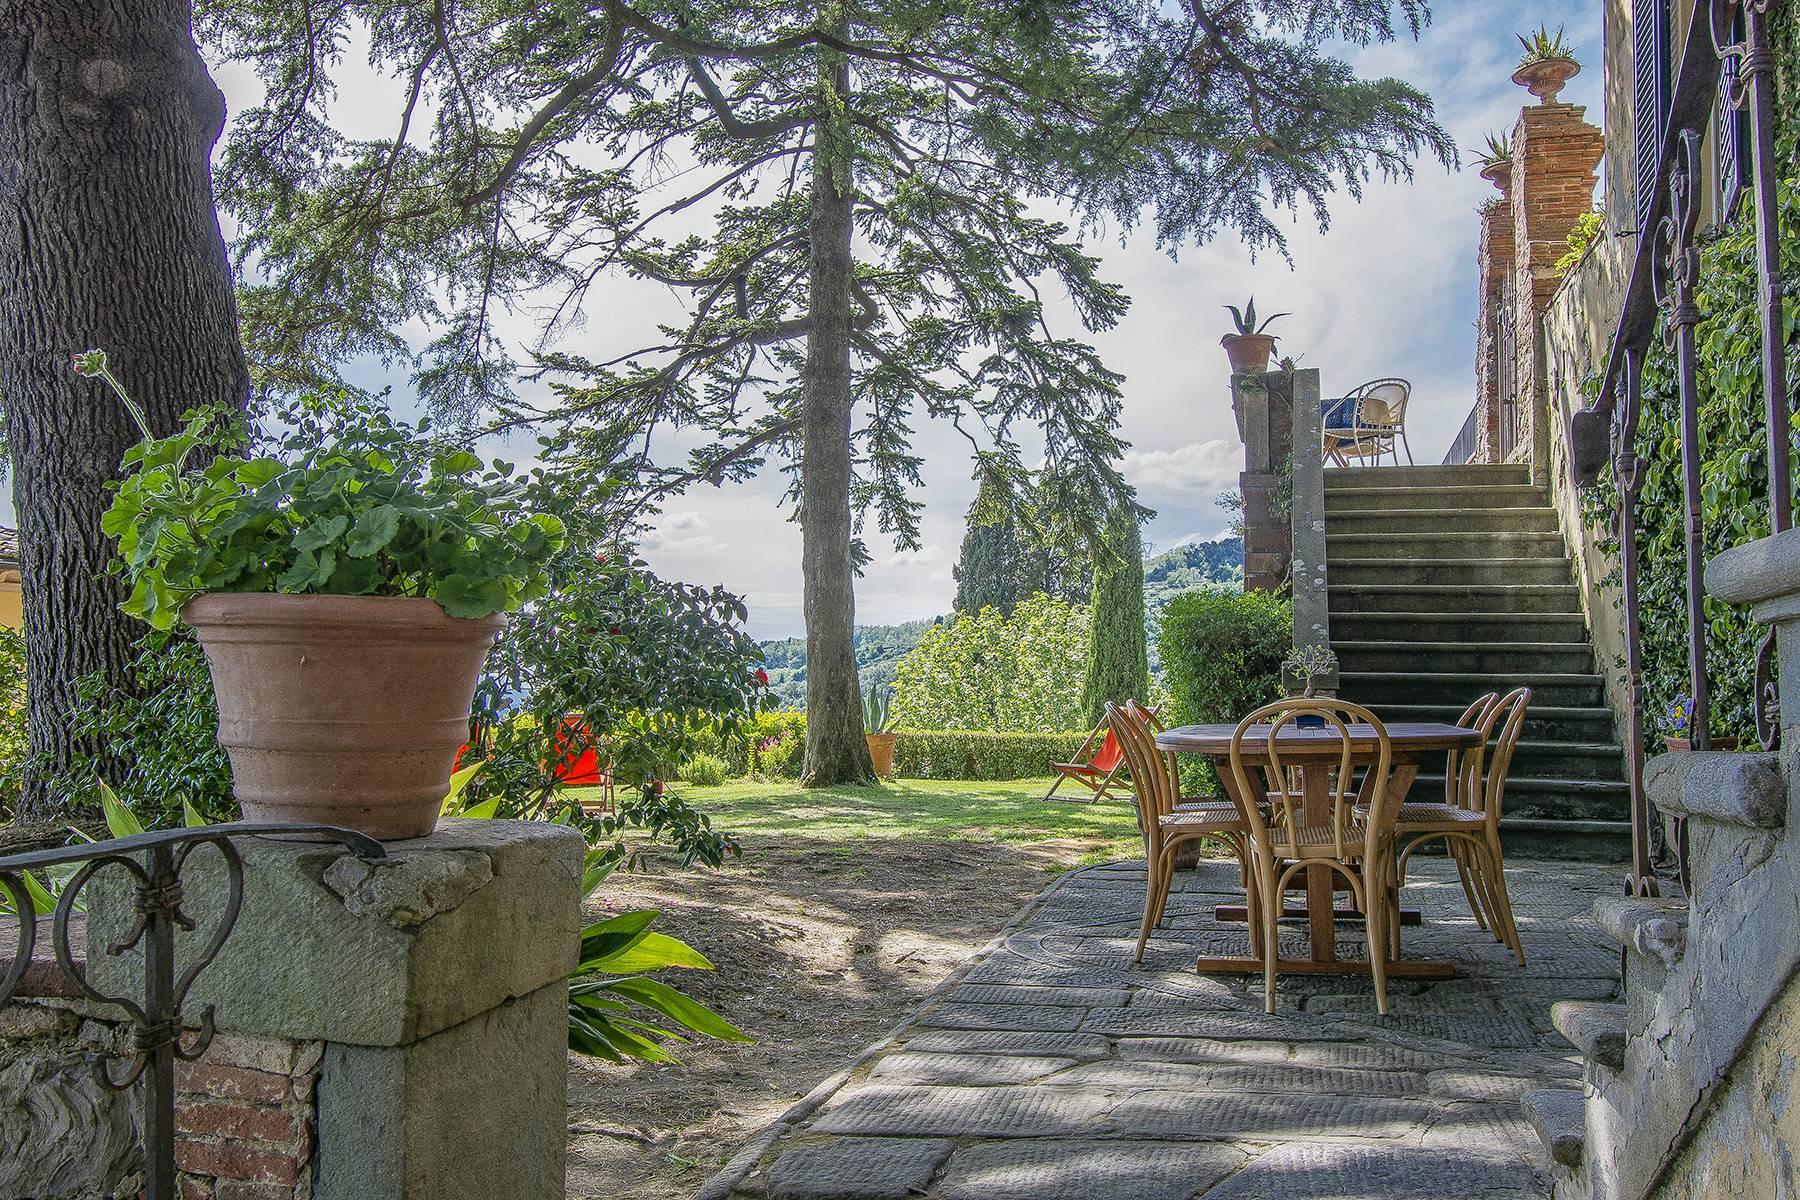 Villa in Vendita a Capannori: 5 locali, 380 mq - Foto 24